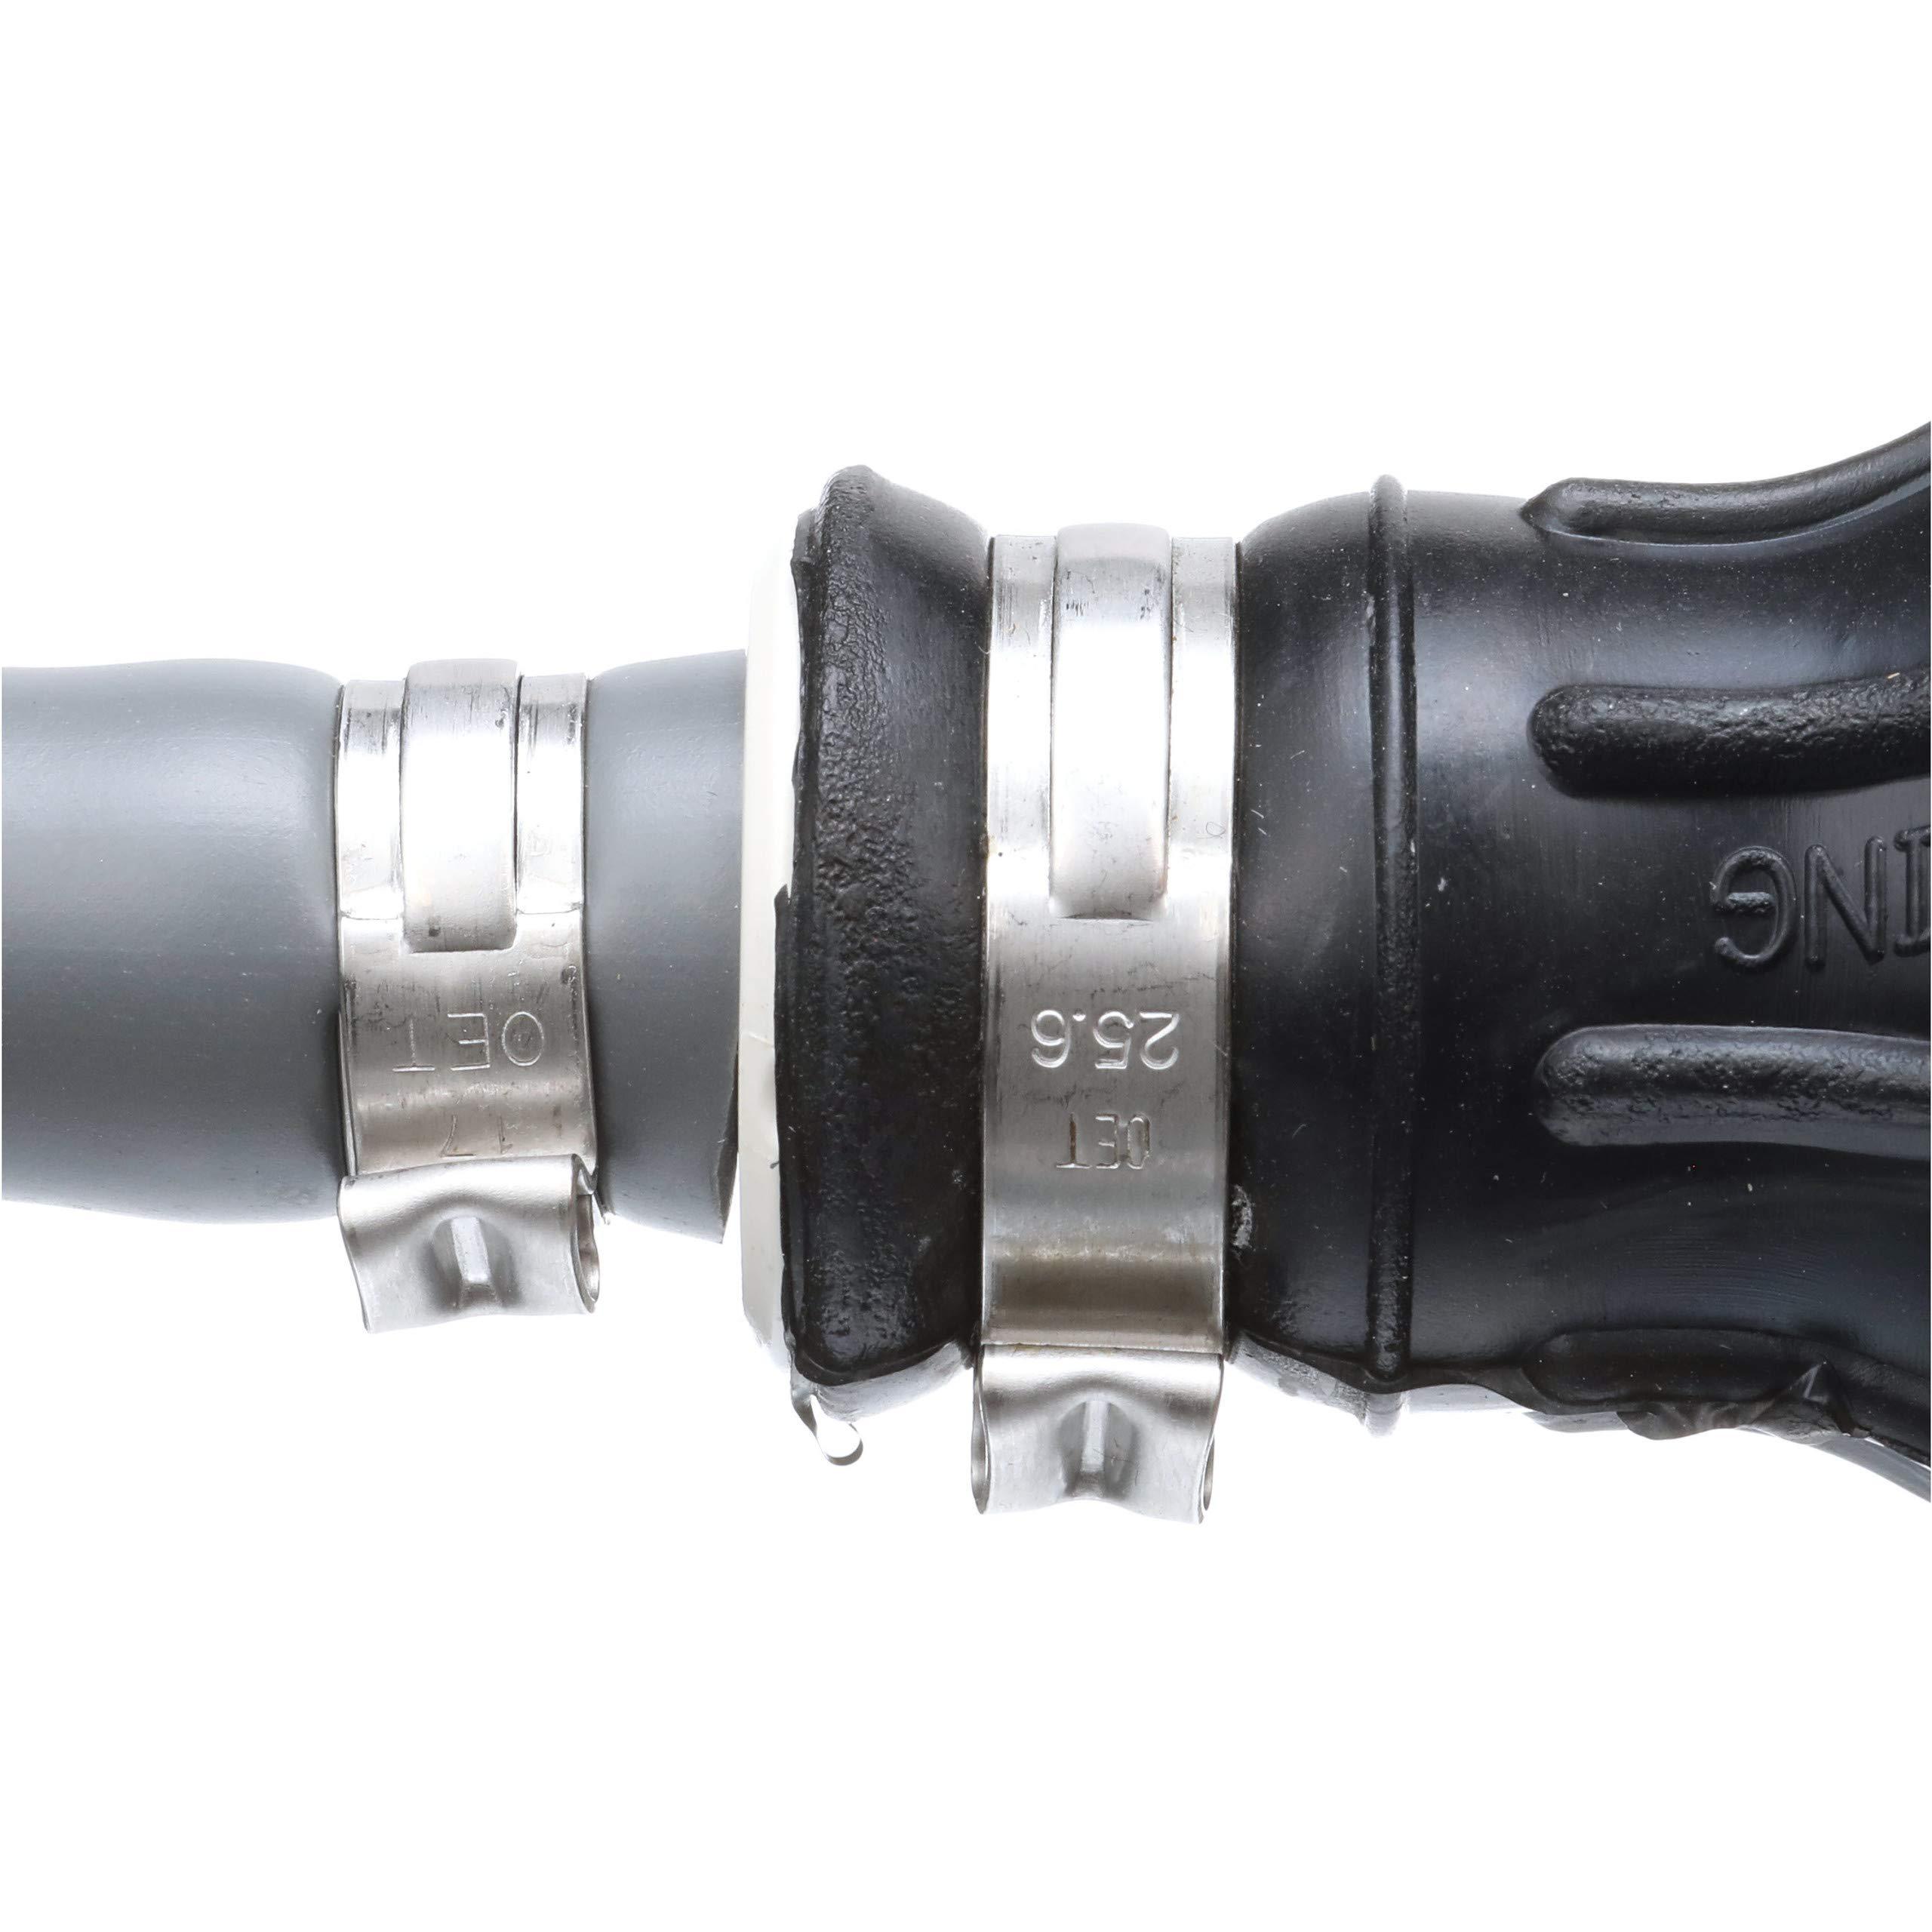 SEACHOICE 21371 Low Perm Fuel Line Kit Johnson/Evinrude, 3/8'' X 7', Multi-Color by SEACHOICE (Image #6)